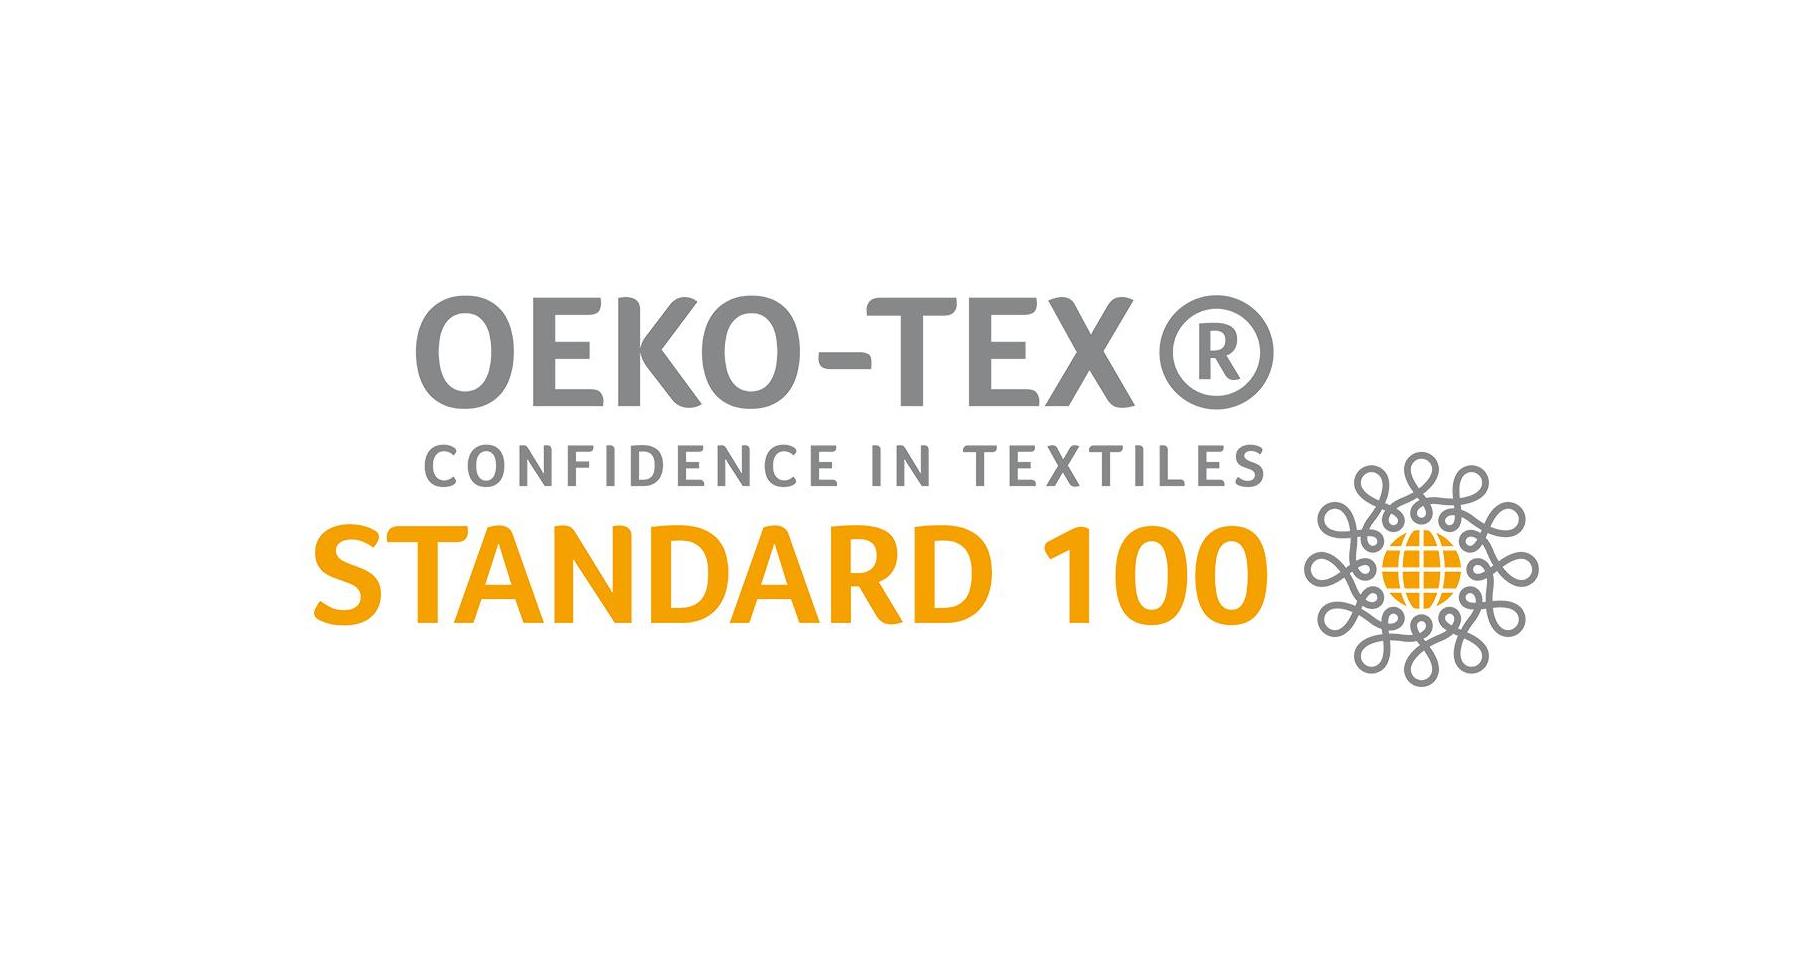 OEKO-TEX® STANARD 100